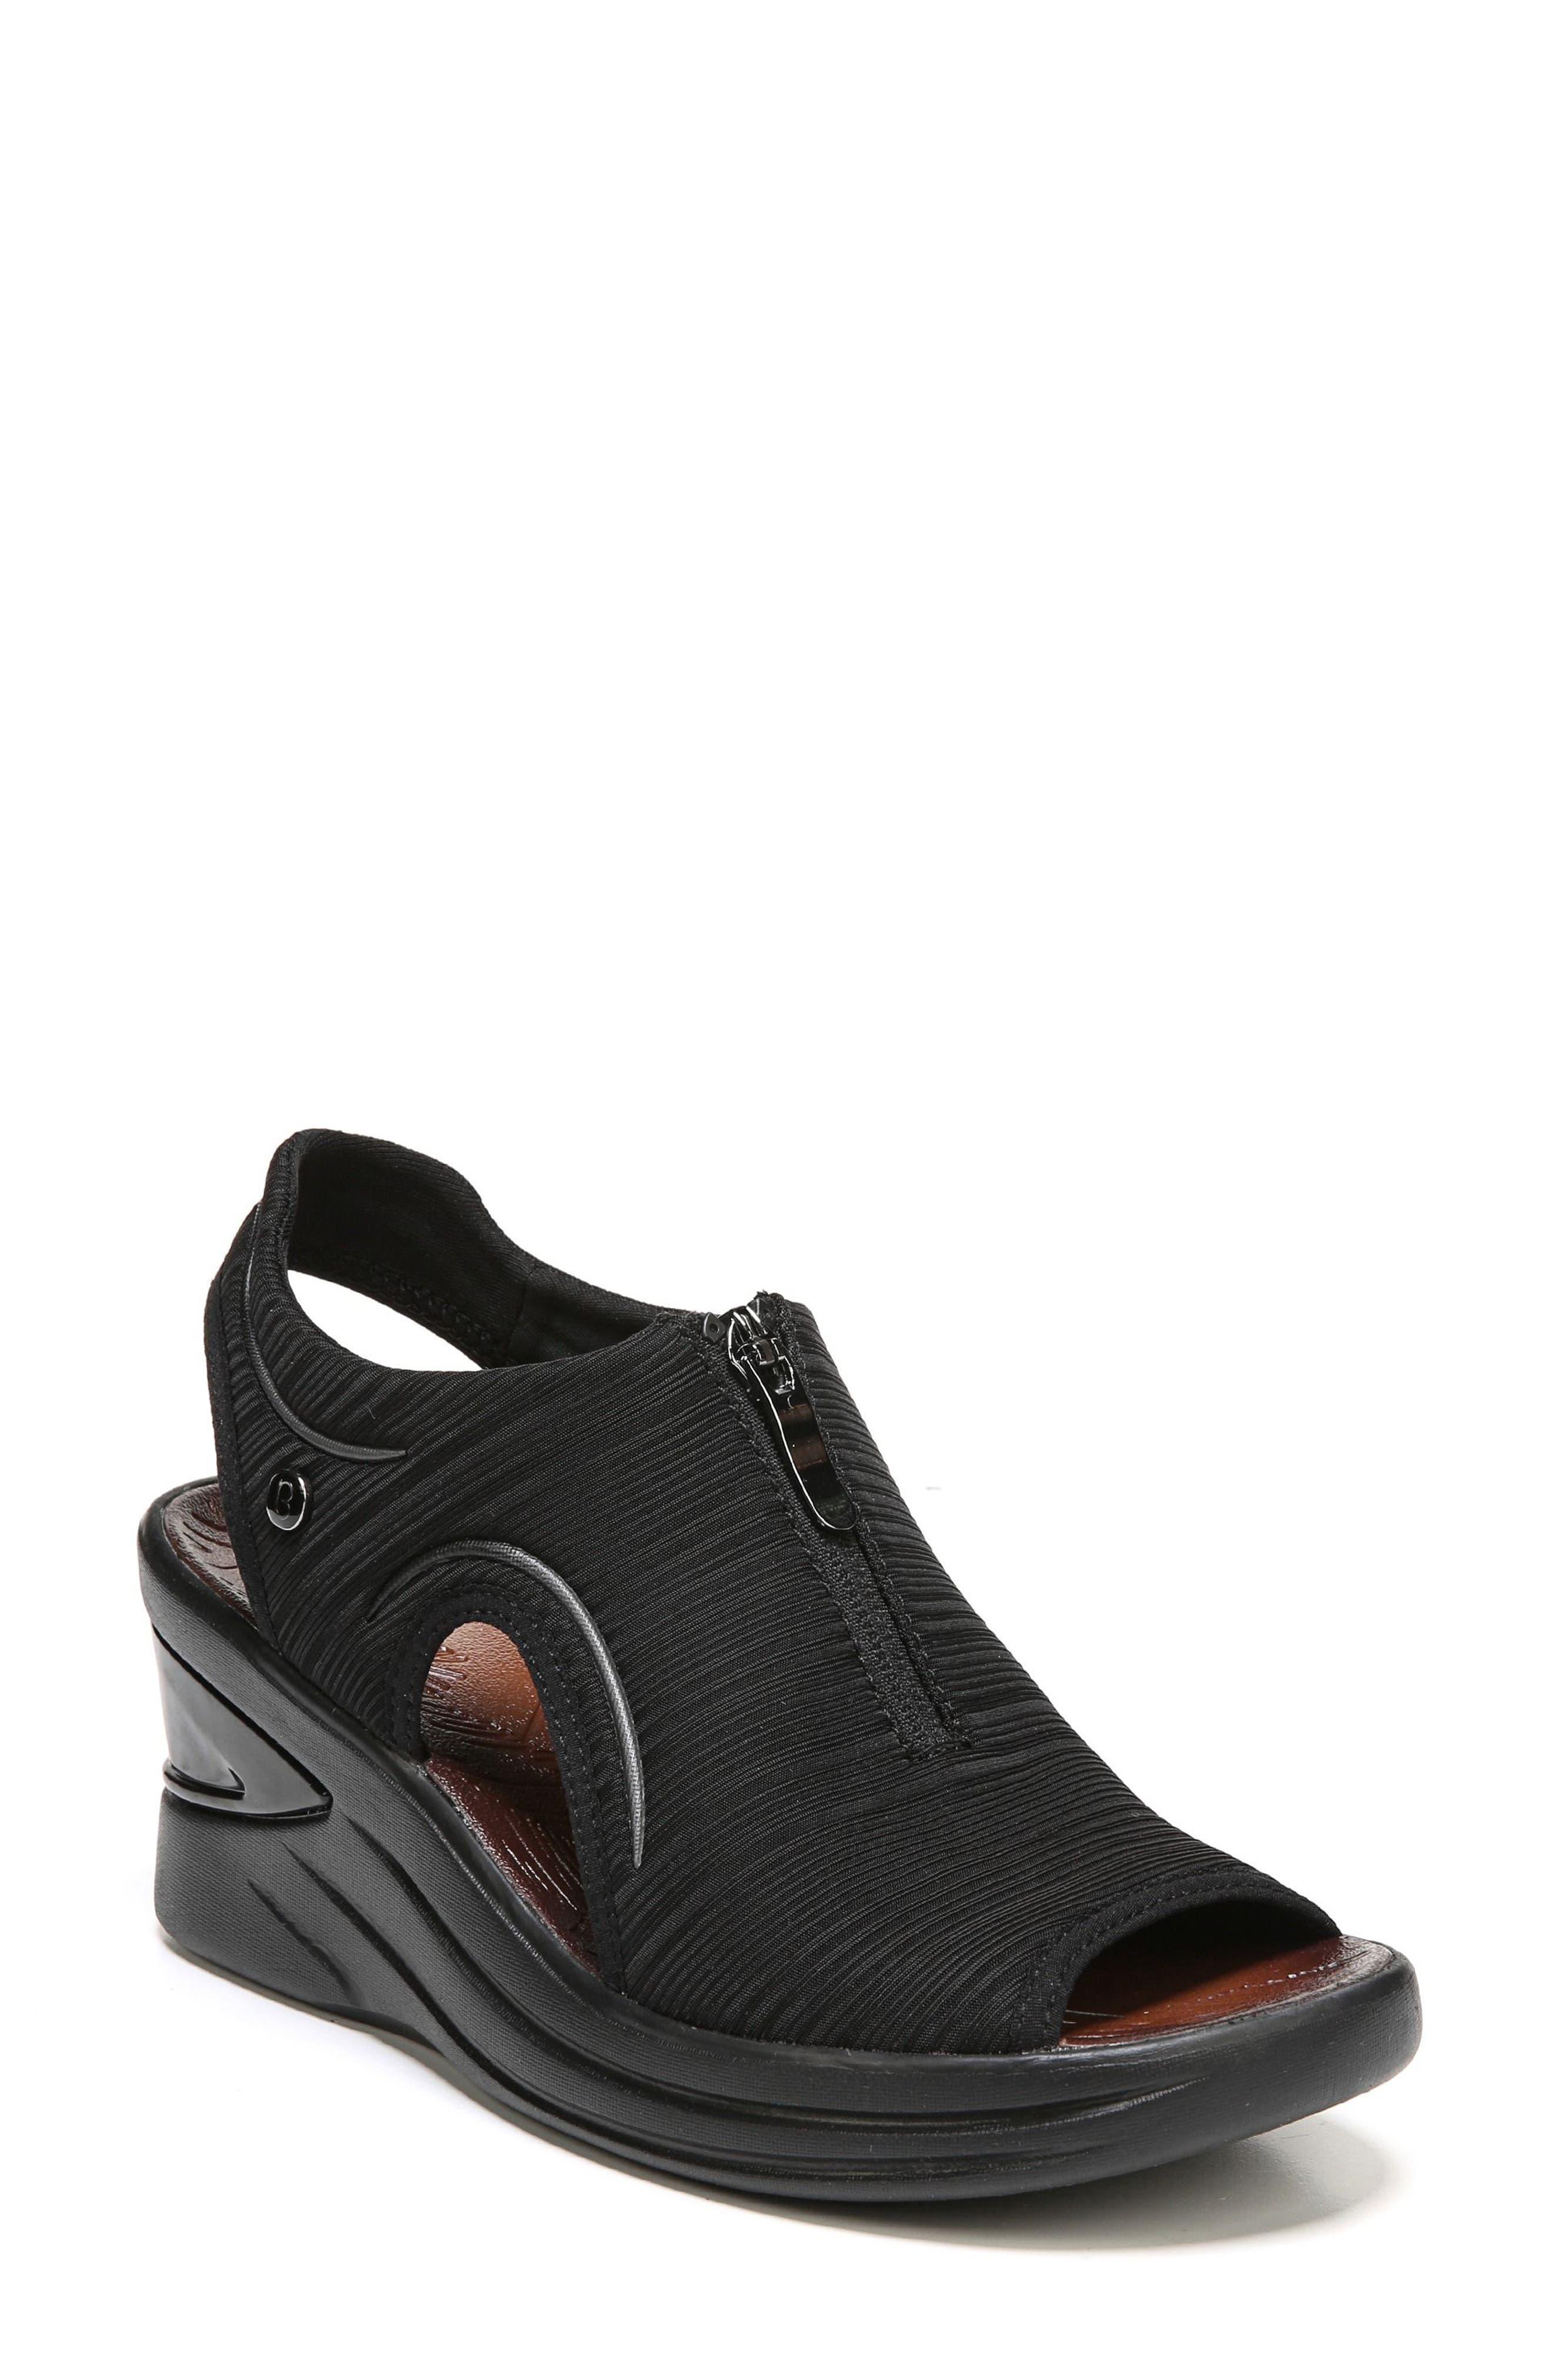 Vinny Wedge Sandal,                             Main thumbnail 1, color,                             BLACK FABRIC